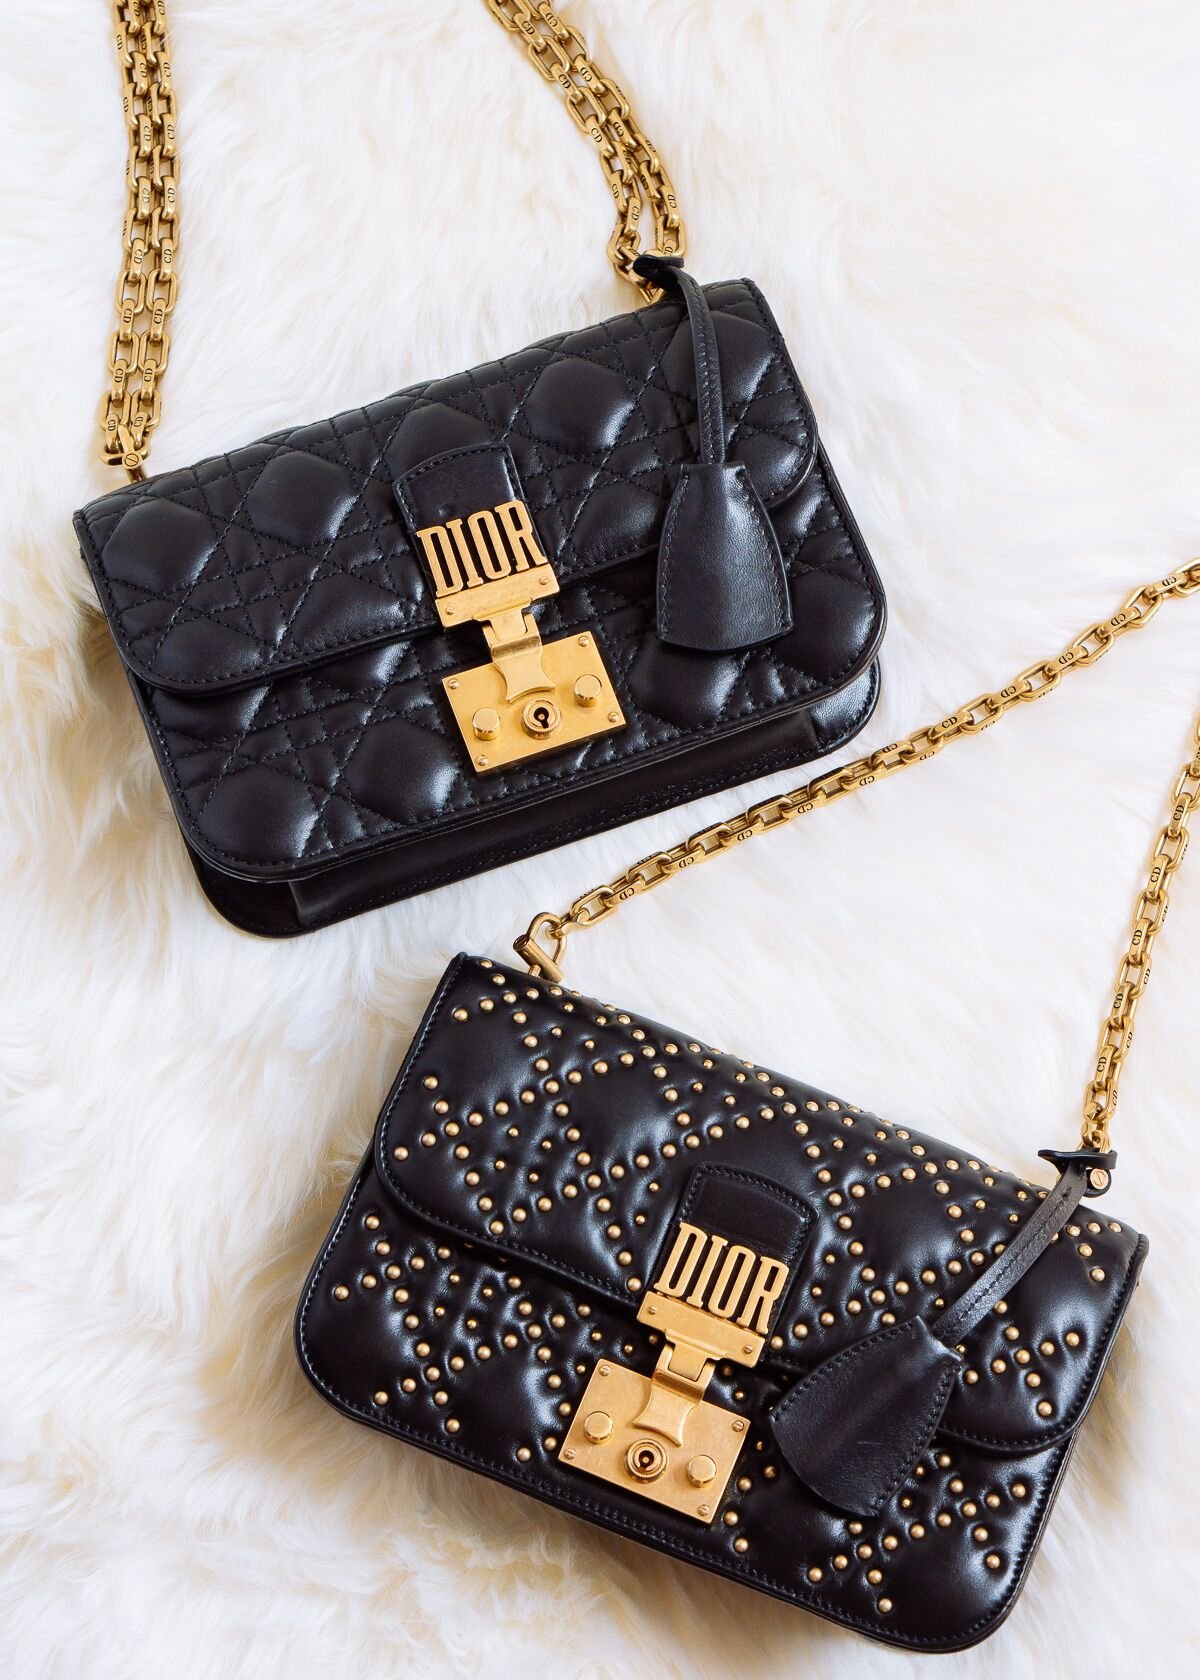 b68d24bc3 Up Close with the Dior Addict Bag - PurseBlog